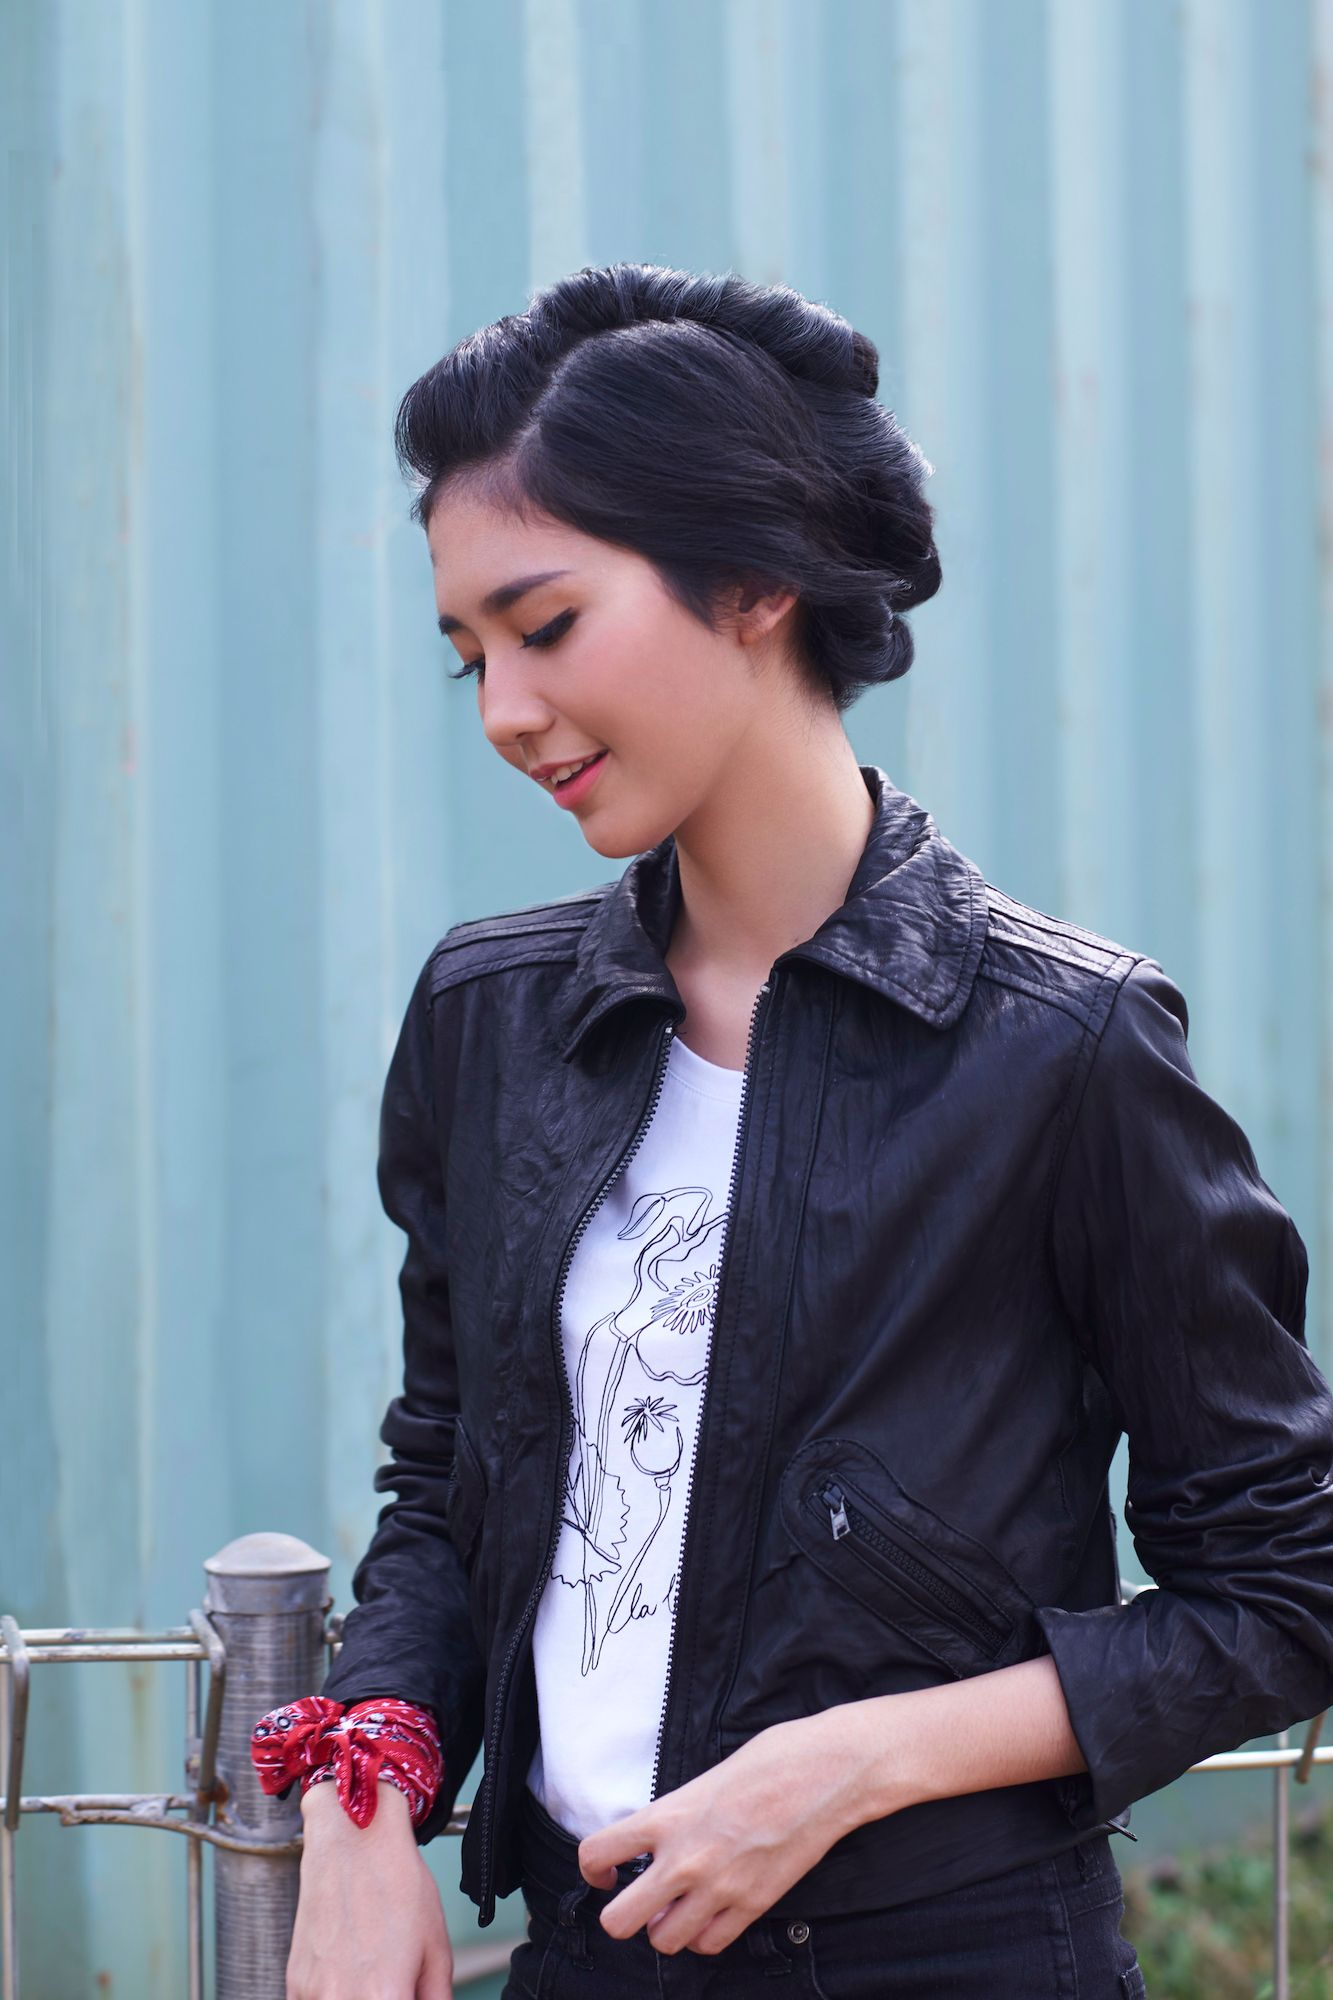 Wanita asia dengan model rambut faux hawk warna hitam